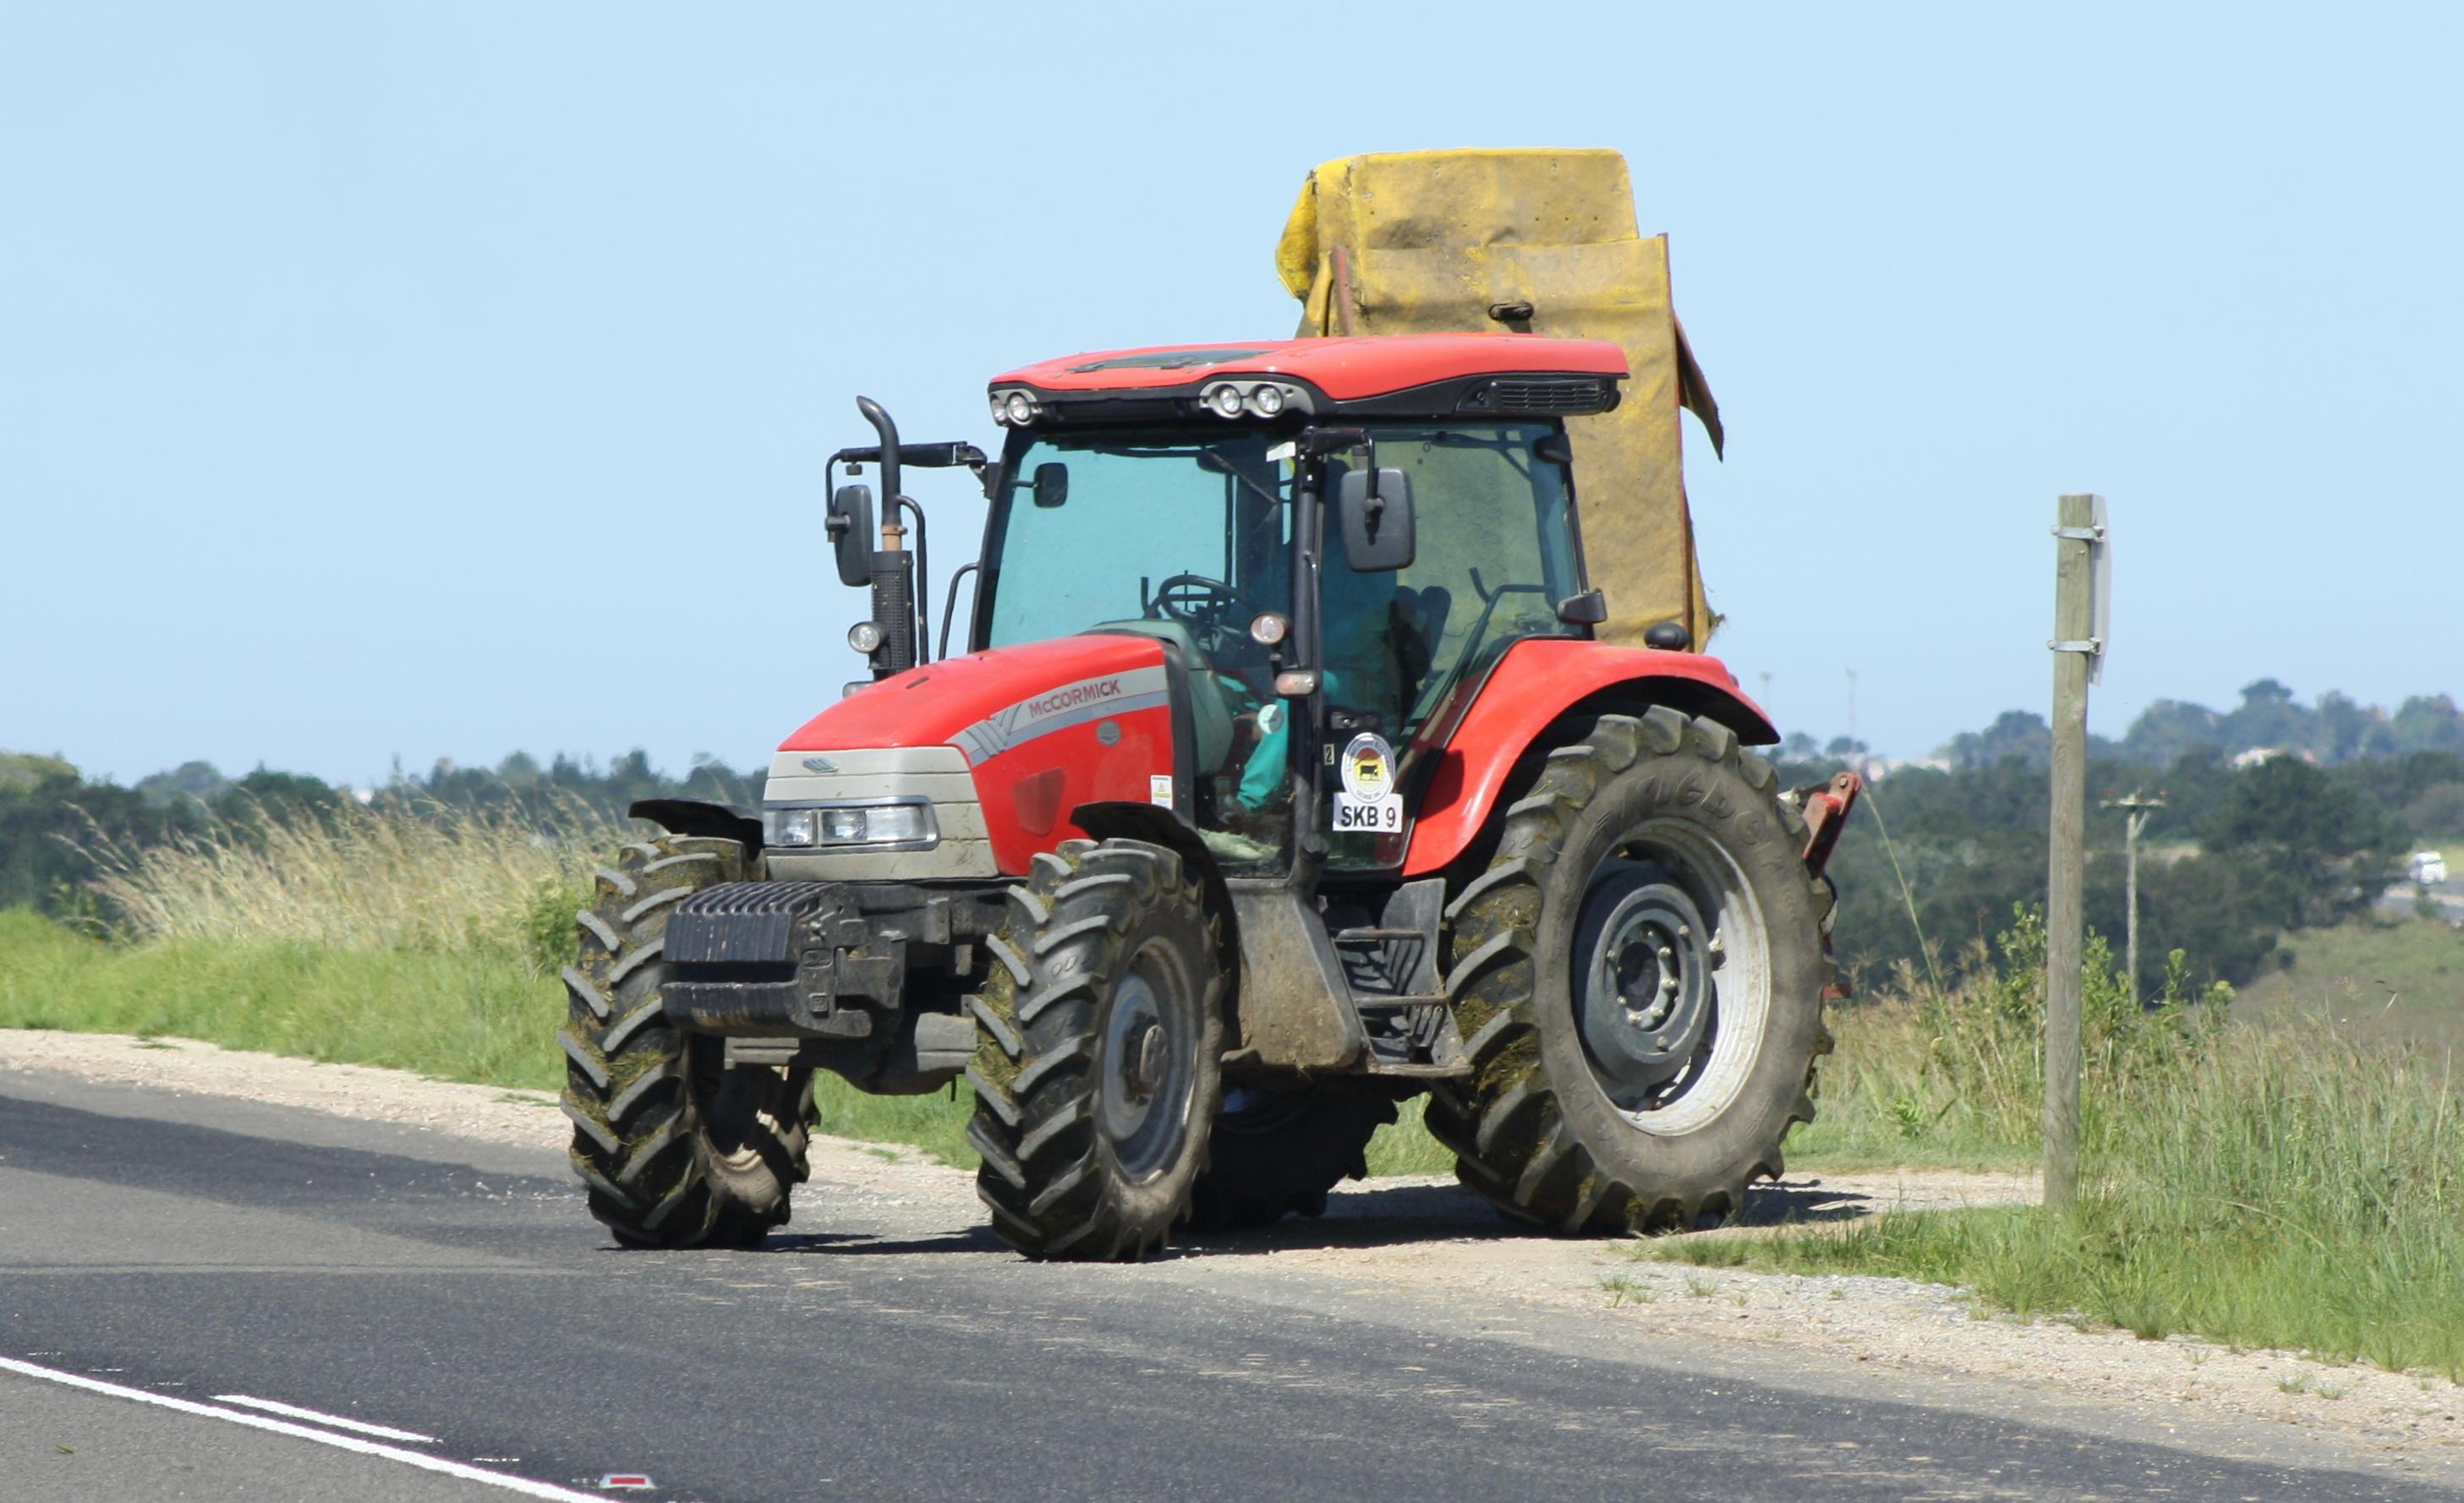 File:McCormick MC115 tractor (16473472721).jpg